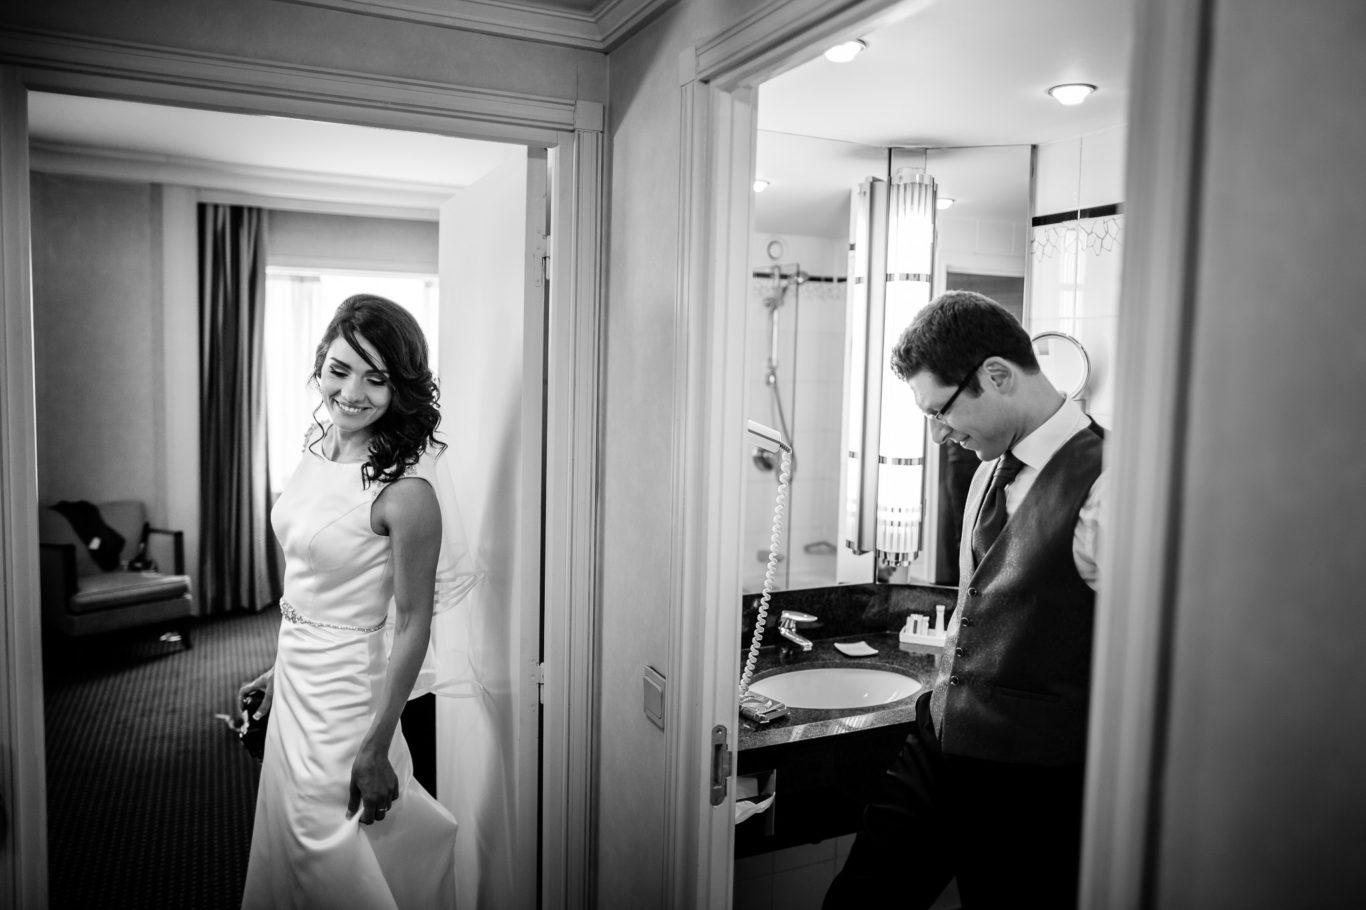 0259-fotografie-nunta-bucuresti-dana-radu-fotograf-ciprian-dumitrescu-dc1_3878